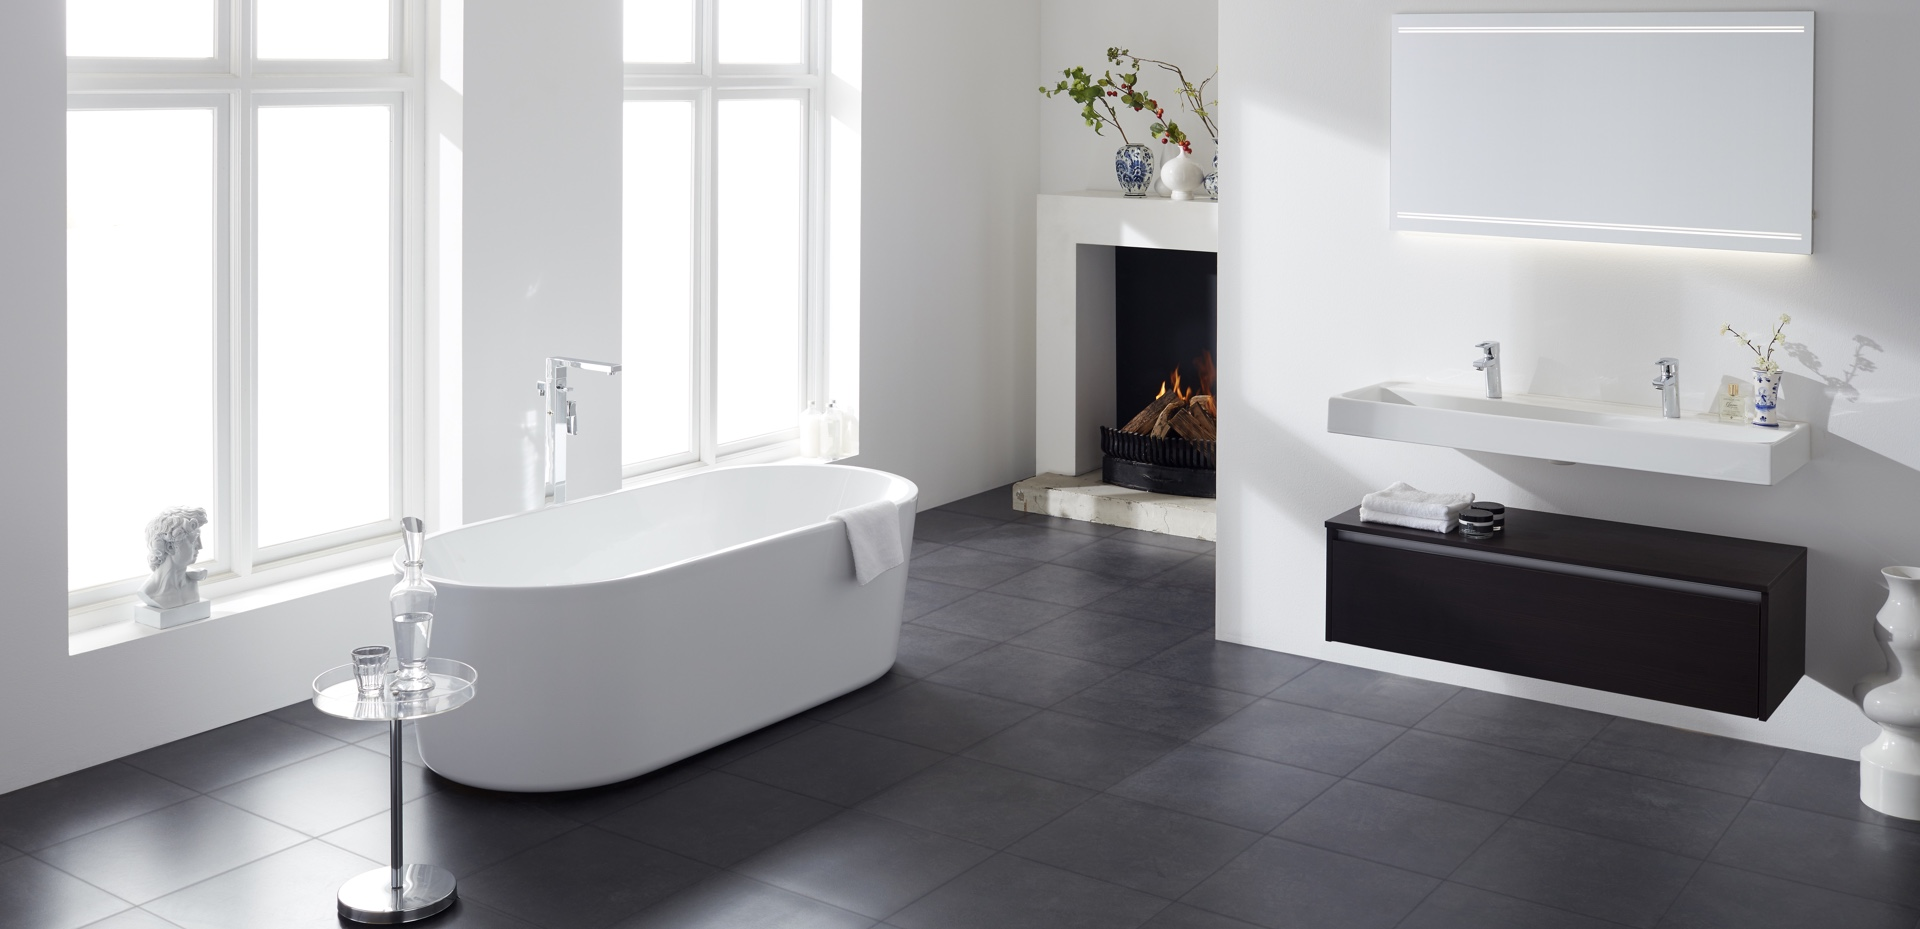 lofty-dreams-trendy-tijdloos-badkamers-mijnbad-in-stijl